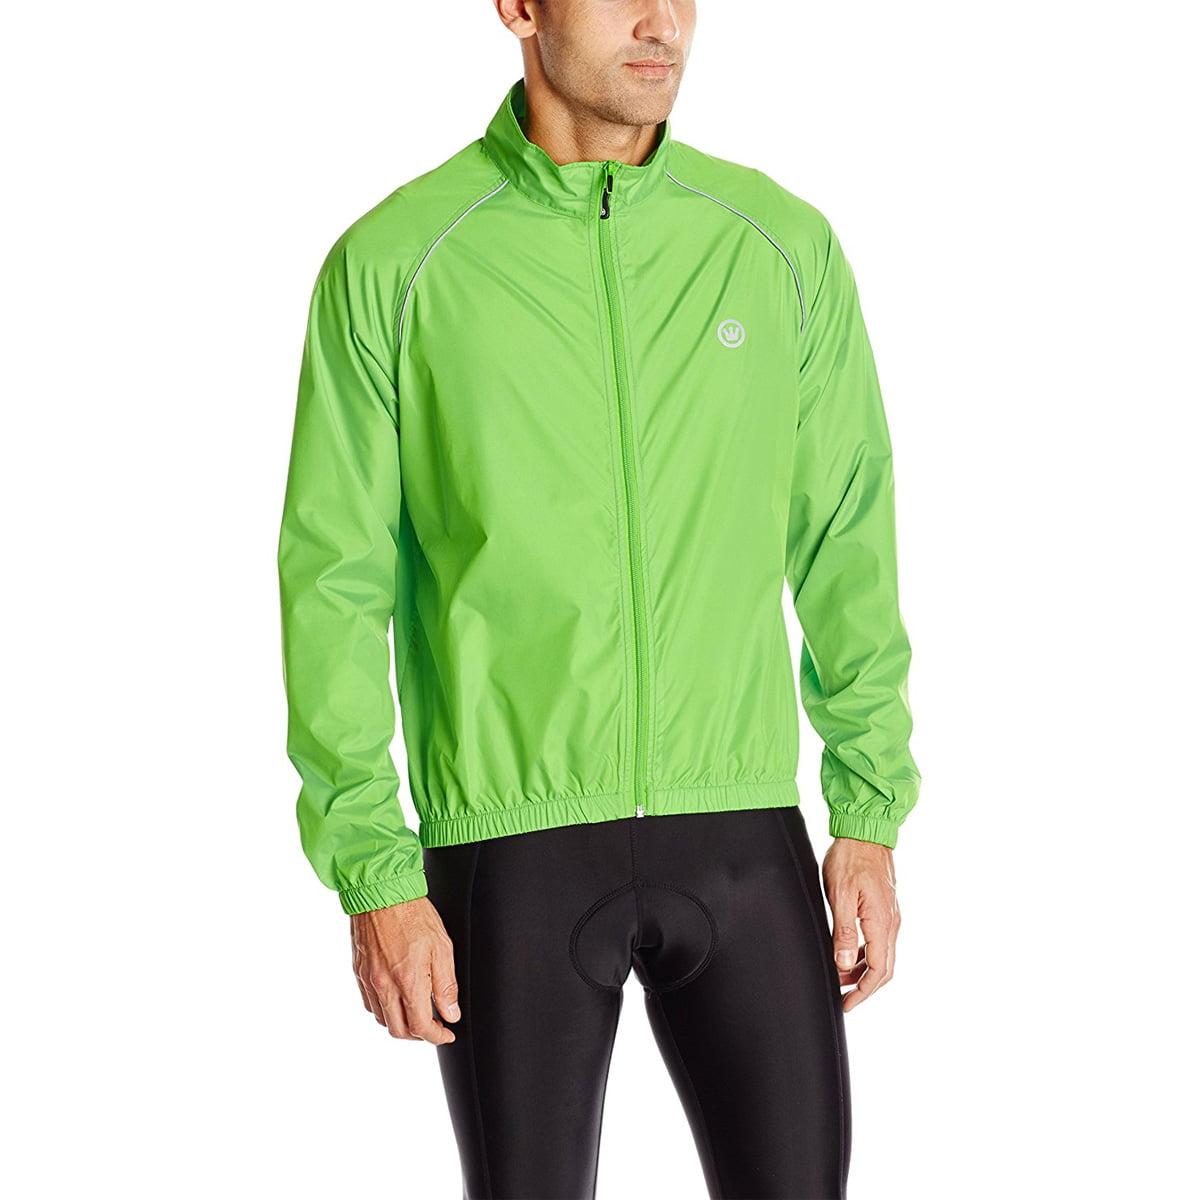 Canari Cyclewear Men's Microlight Shell Cycling Jacket - 1711